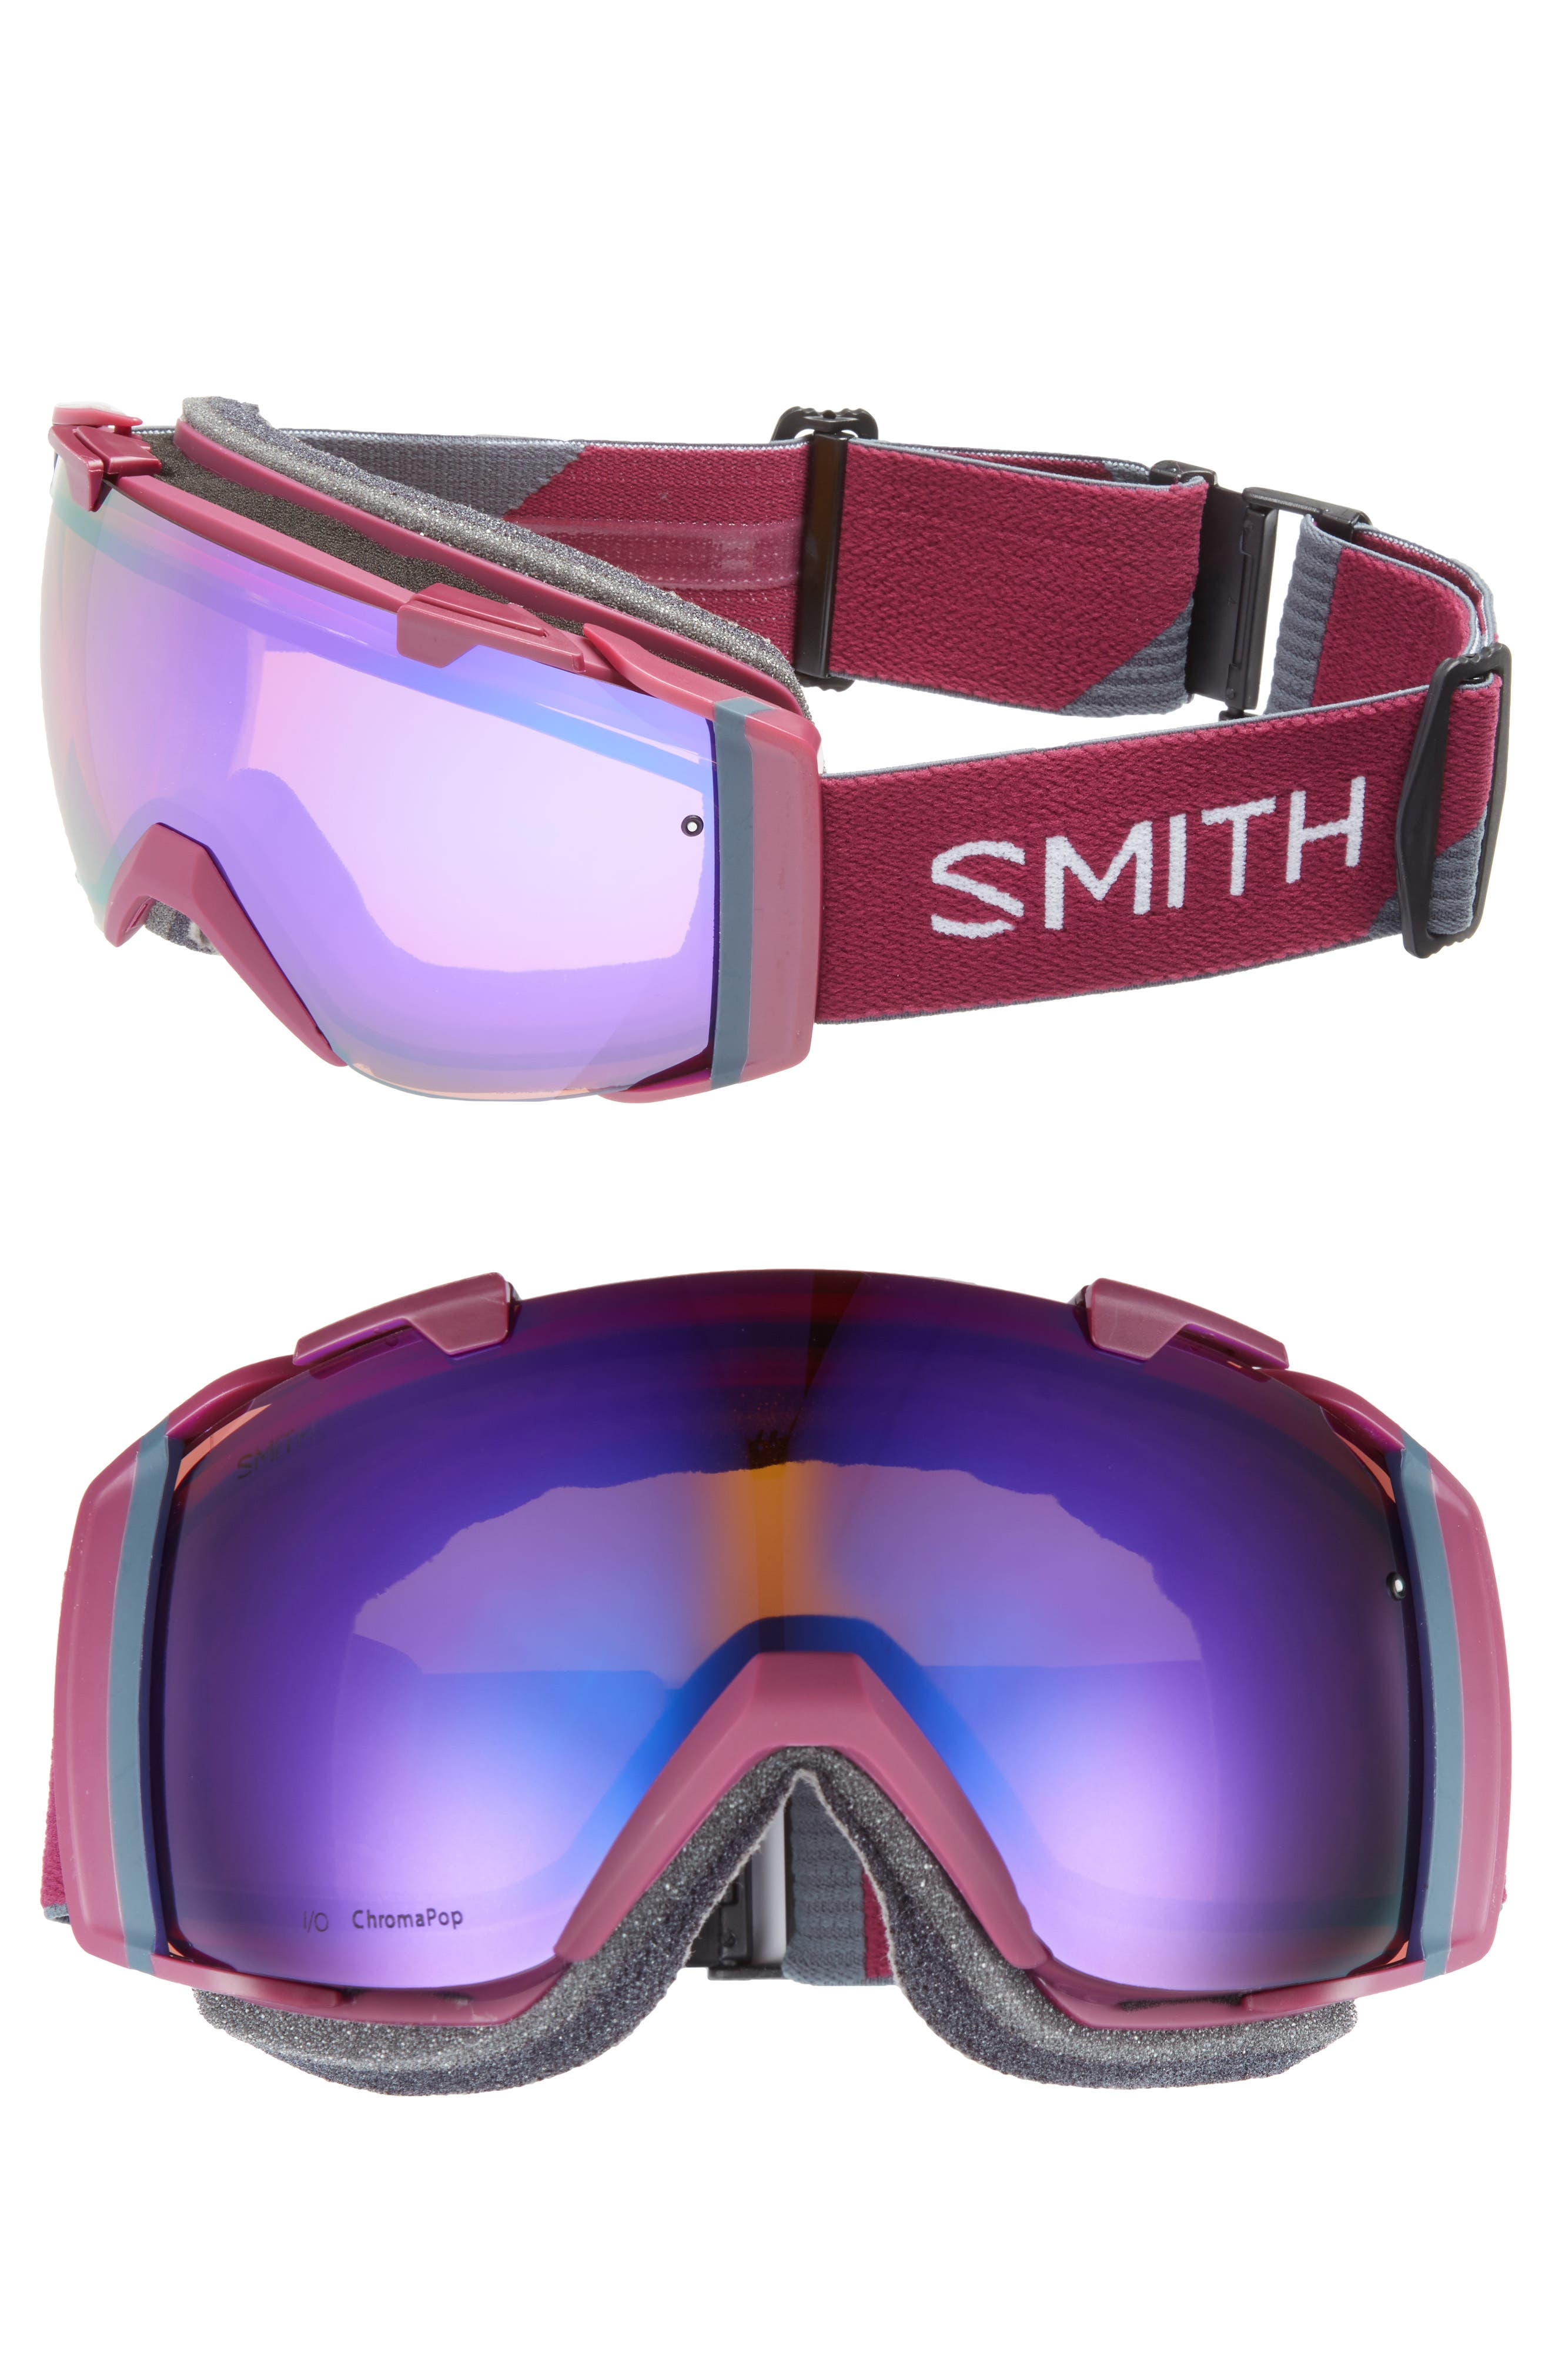 Smith I/O 180mm Snow/Ski Goggles